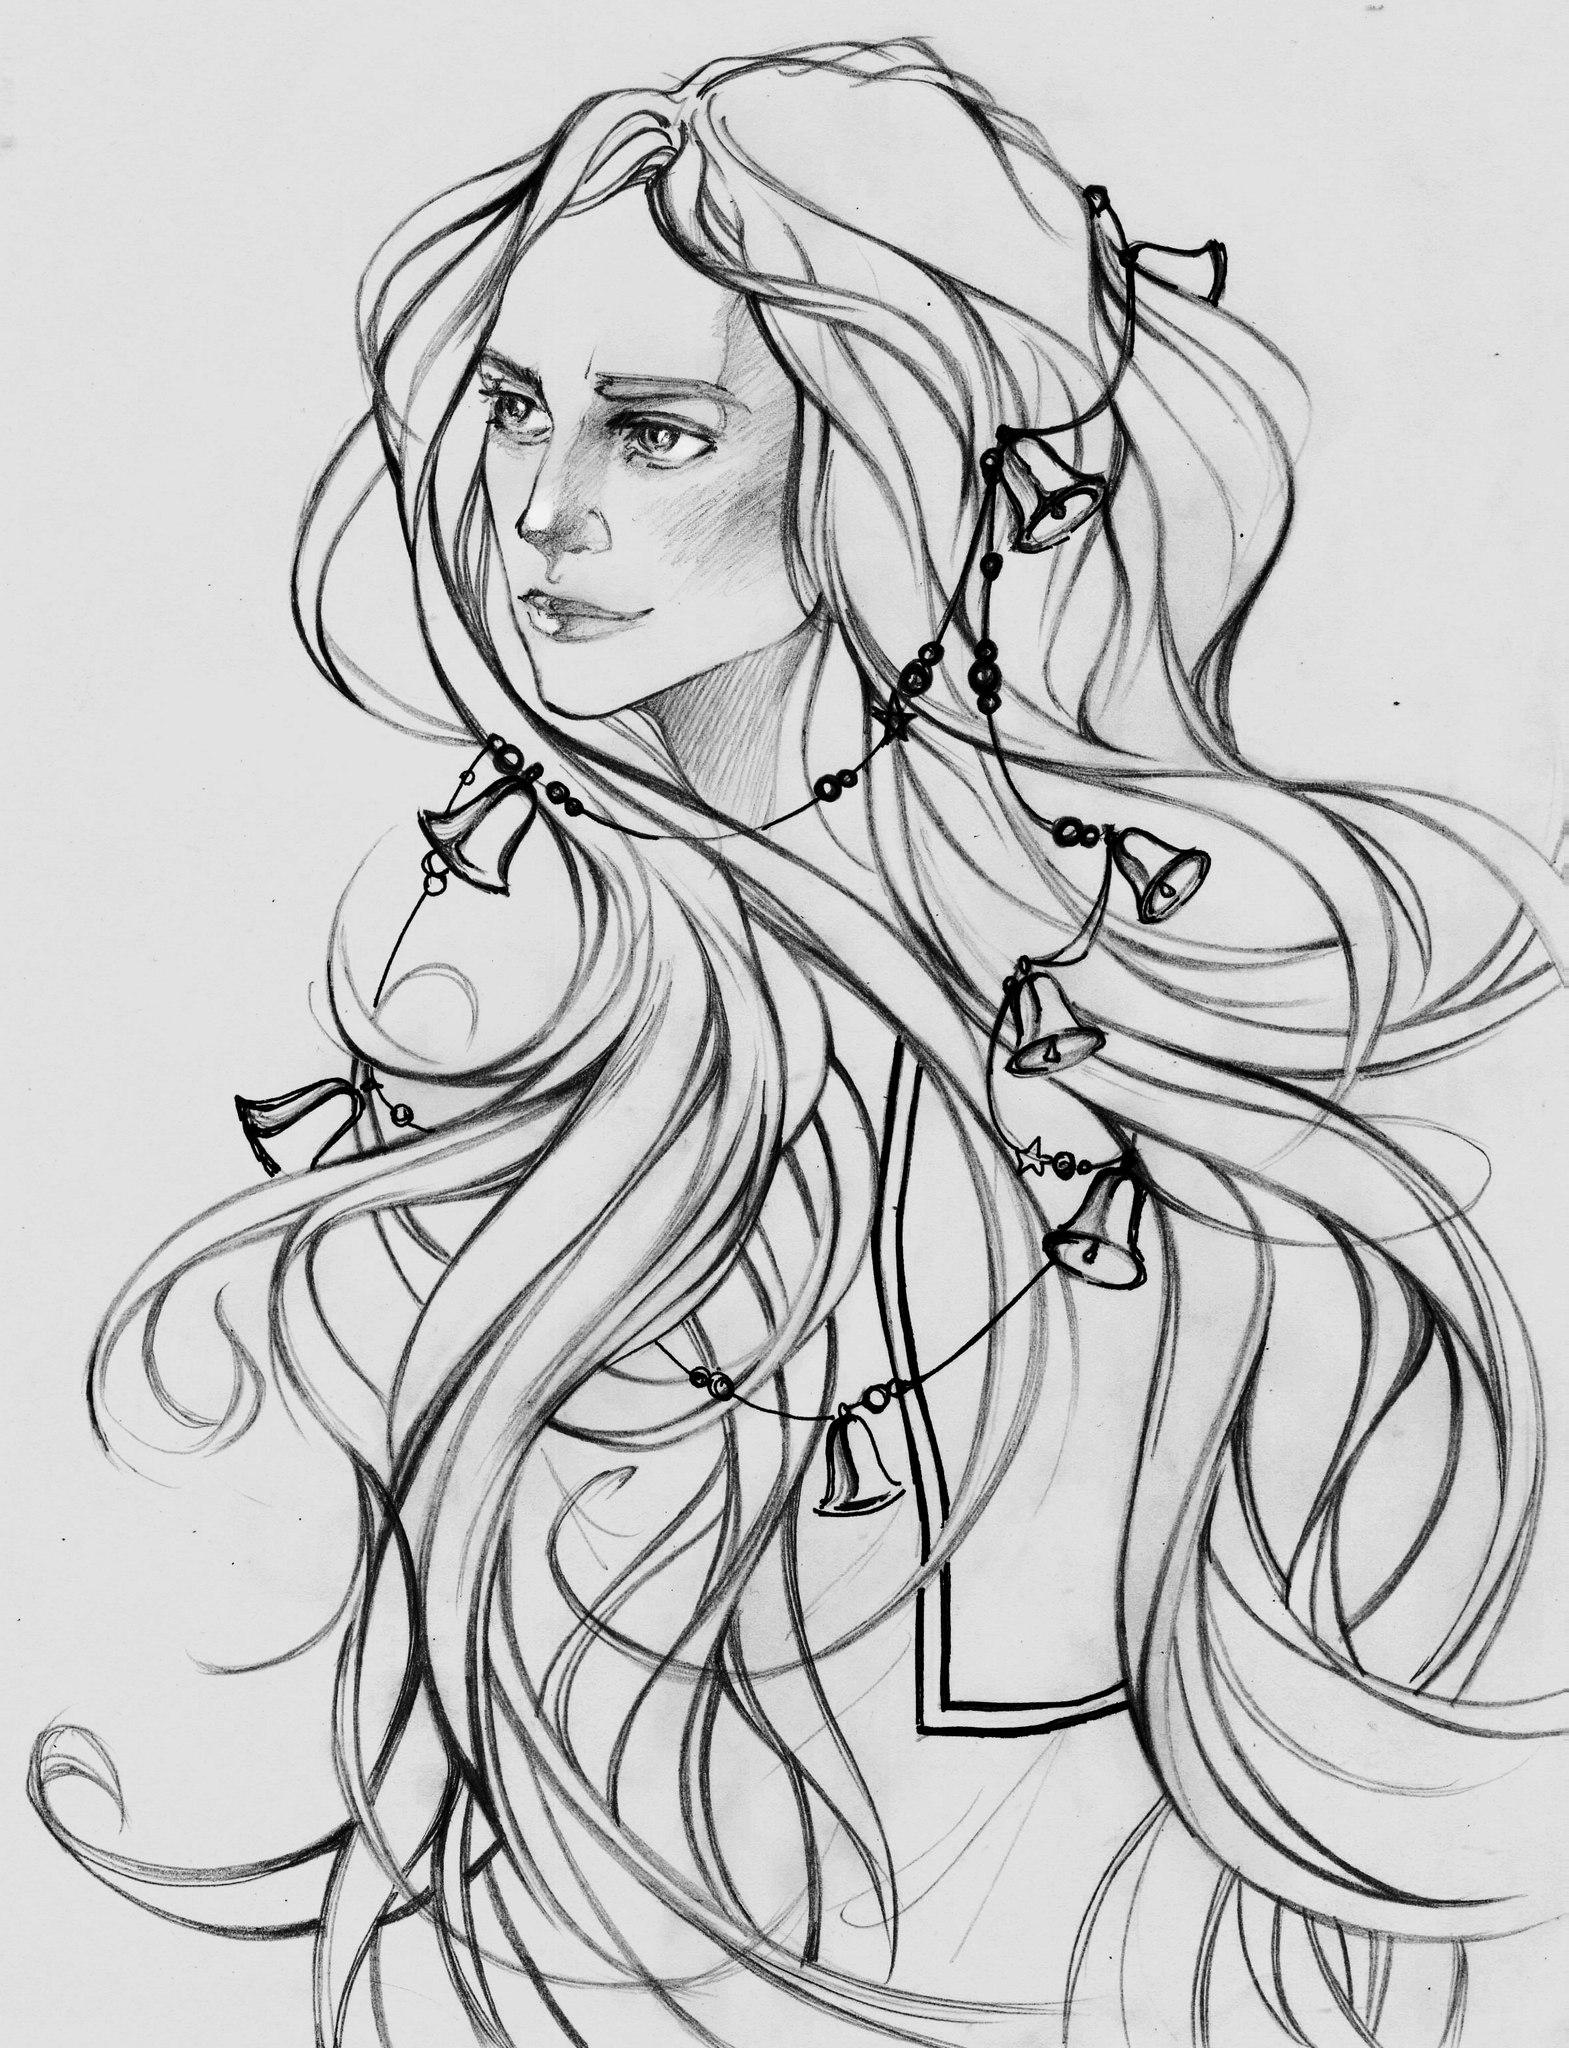 shemale mistress hegre arts